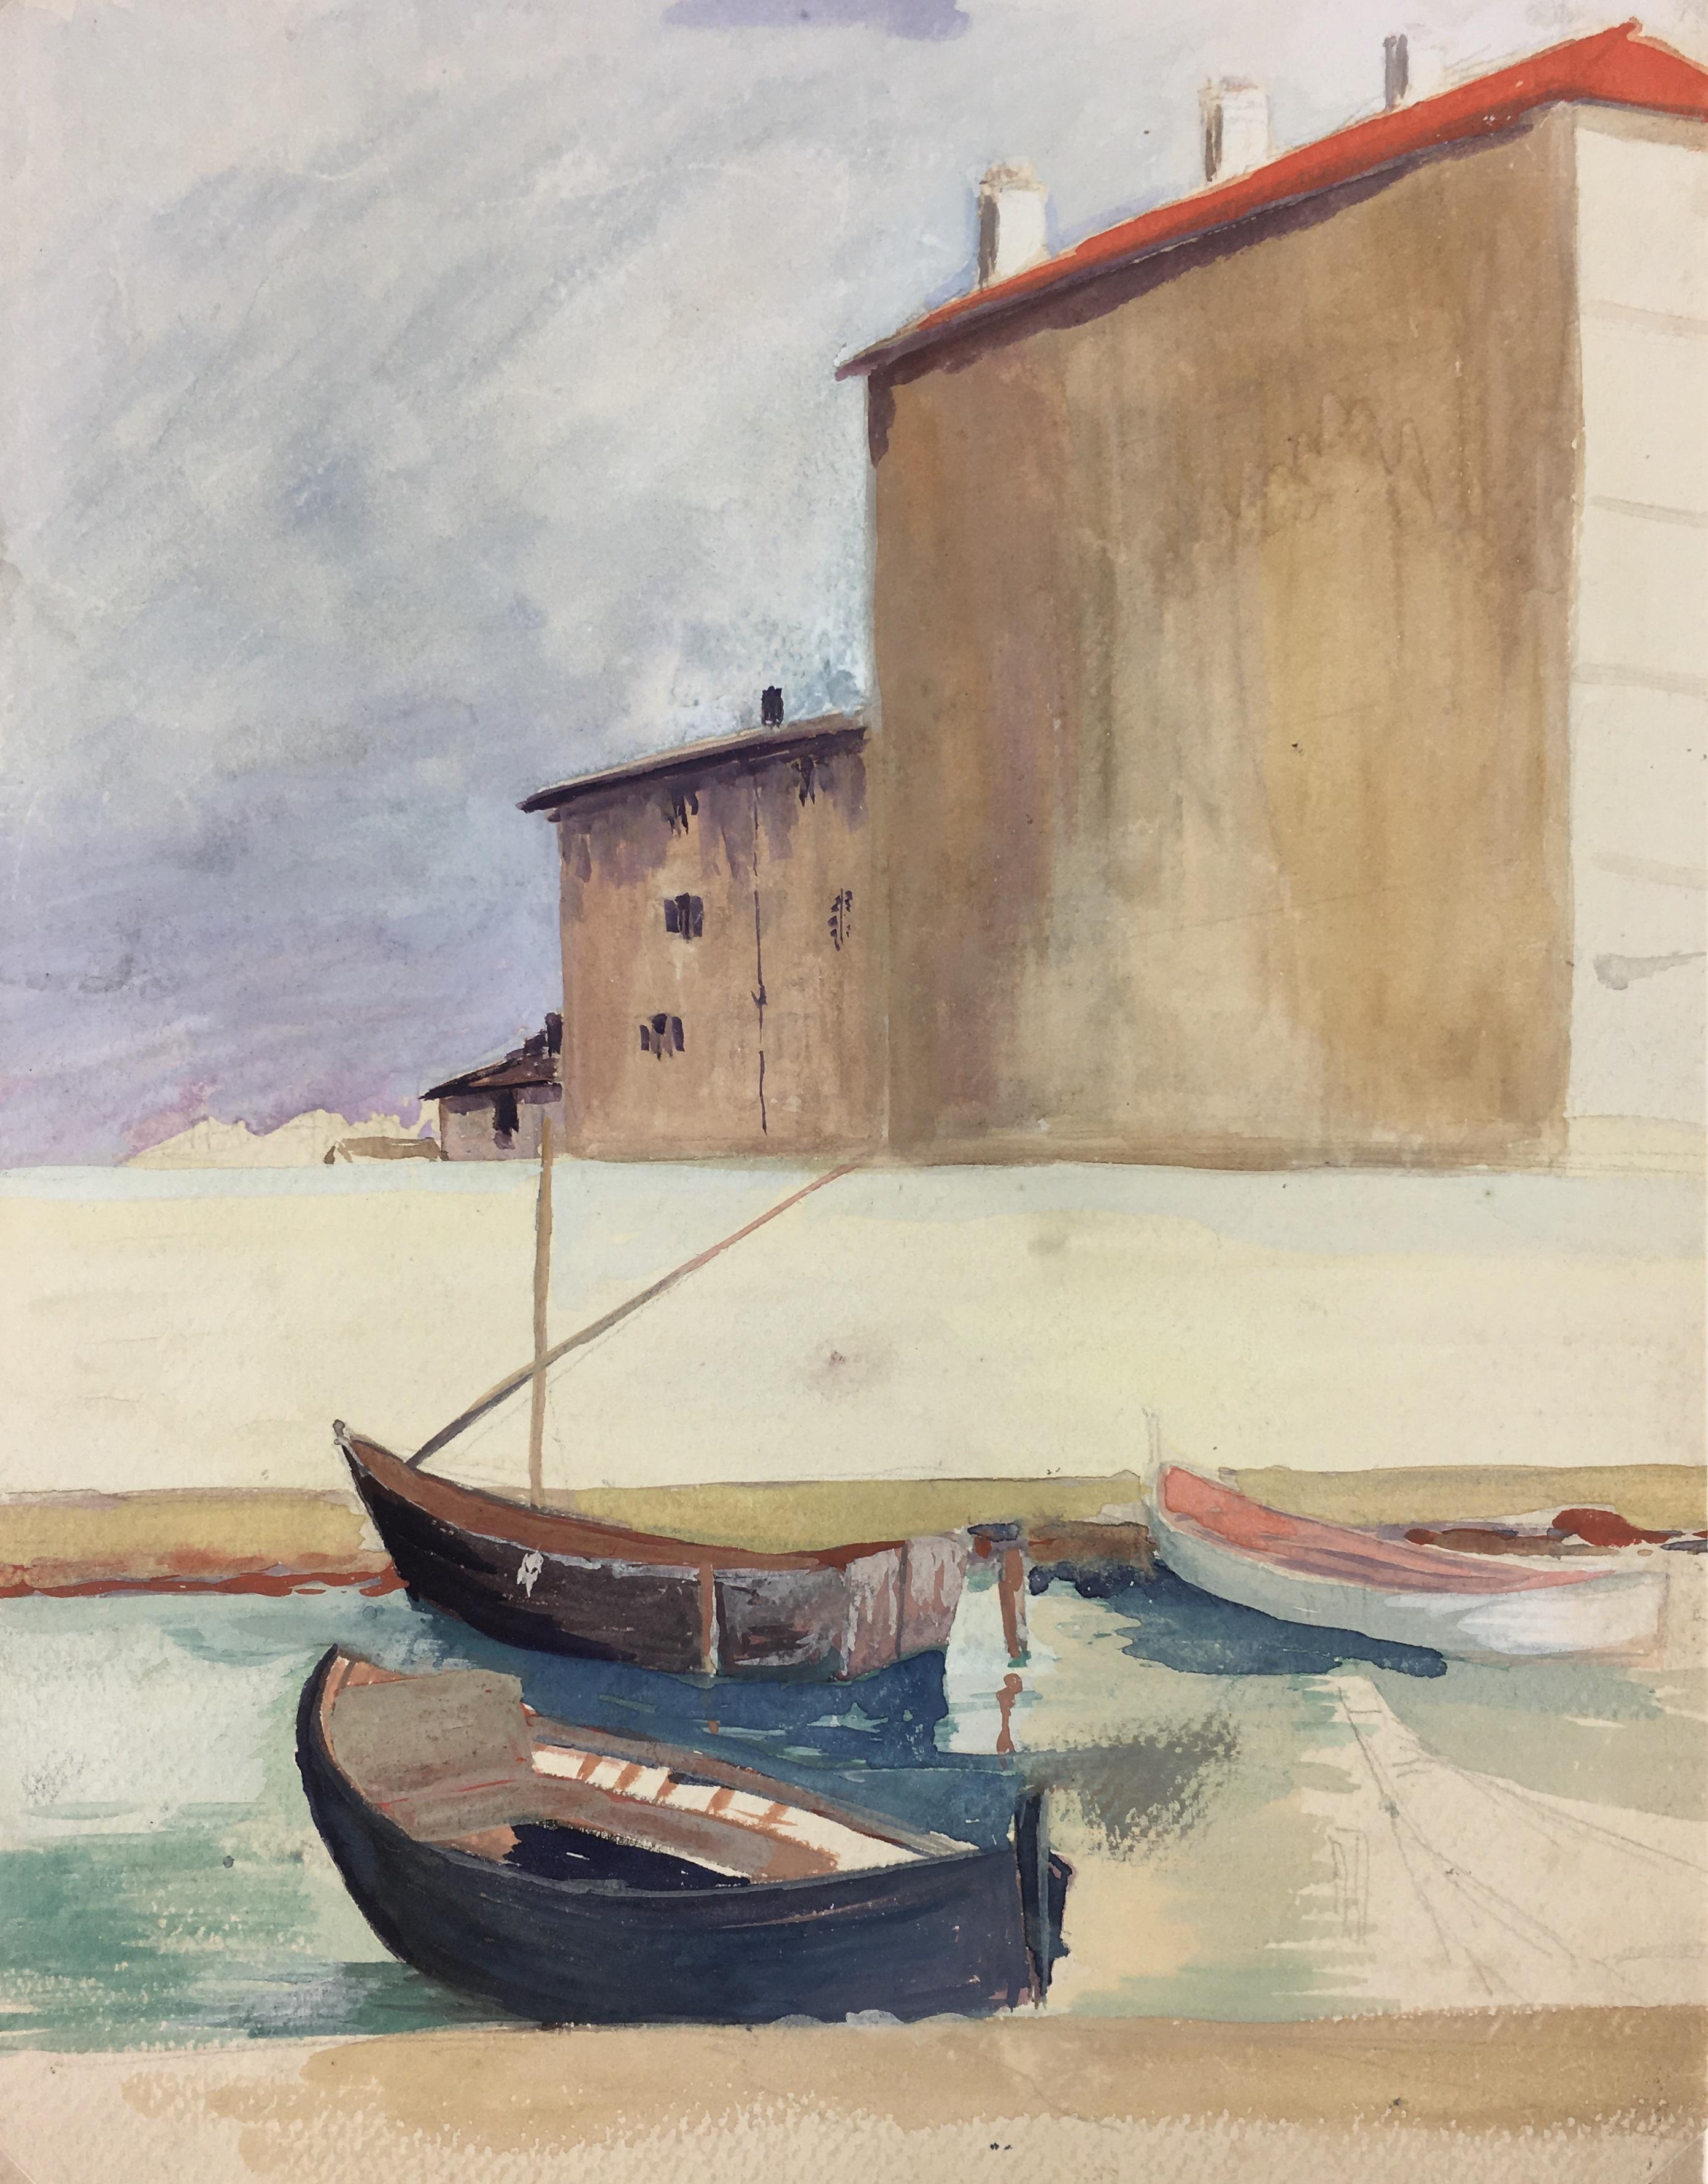 Maritime Original Art - Port Town, c.1970